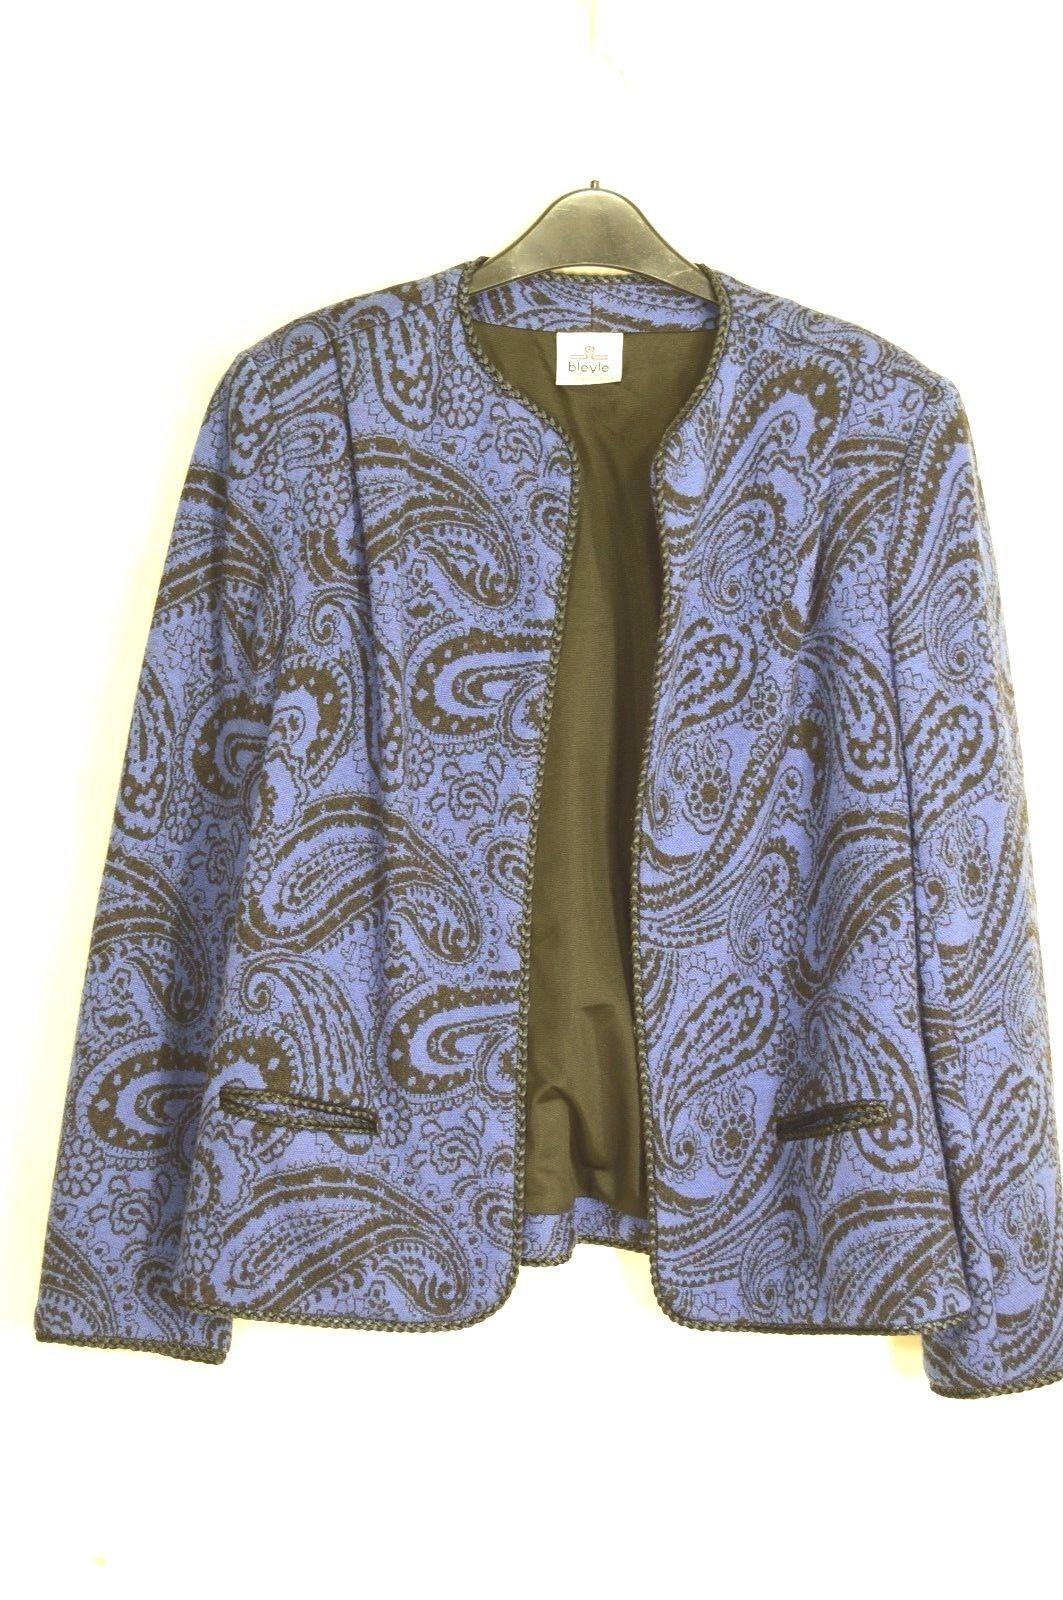 Bleyle jacket vintage M? wool blue black paisley print cropped career lined USA